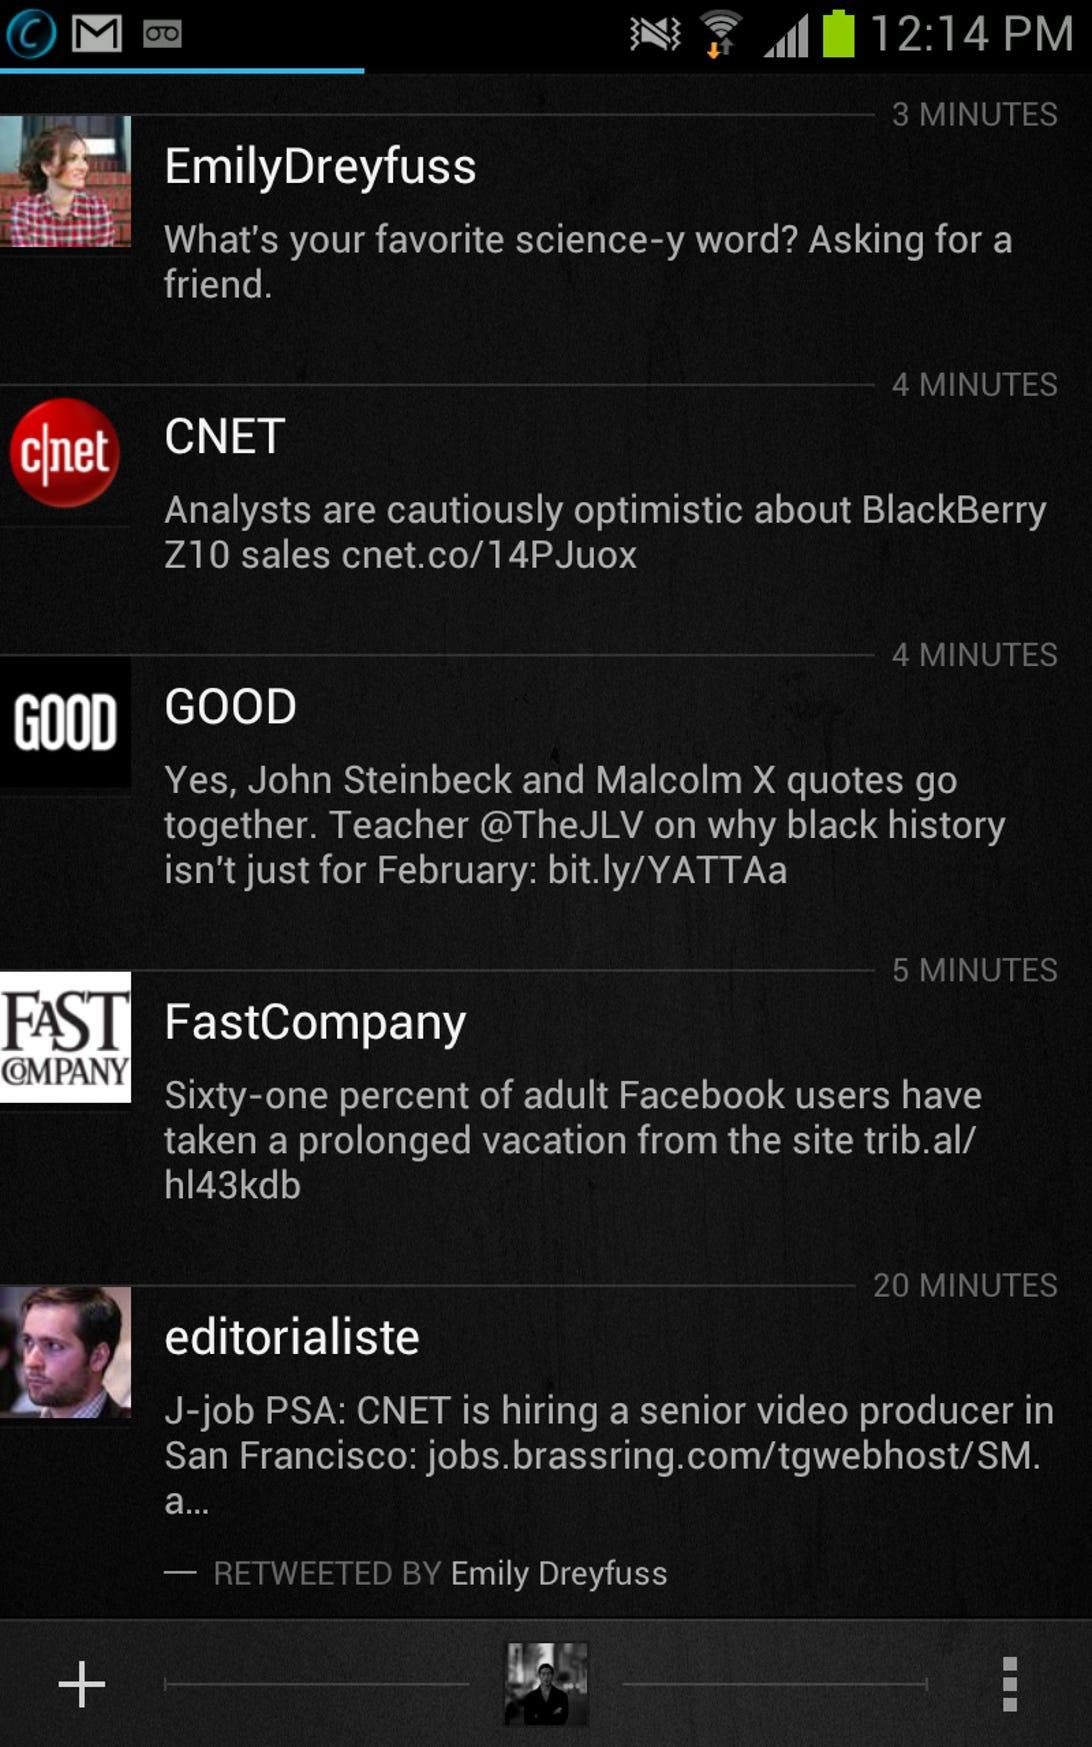 Screenshot_2013-02-05-12-14-44.png